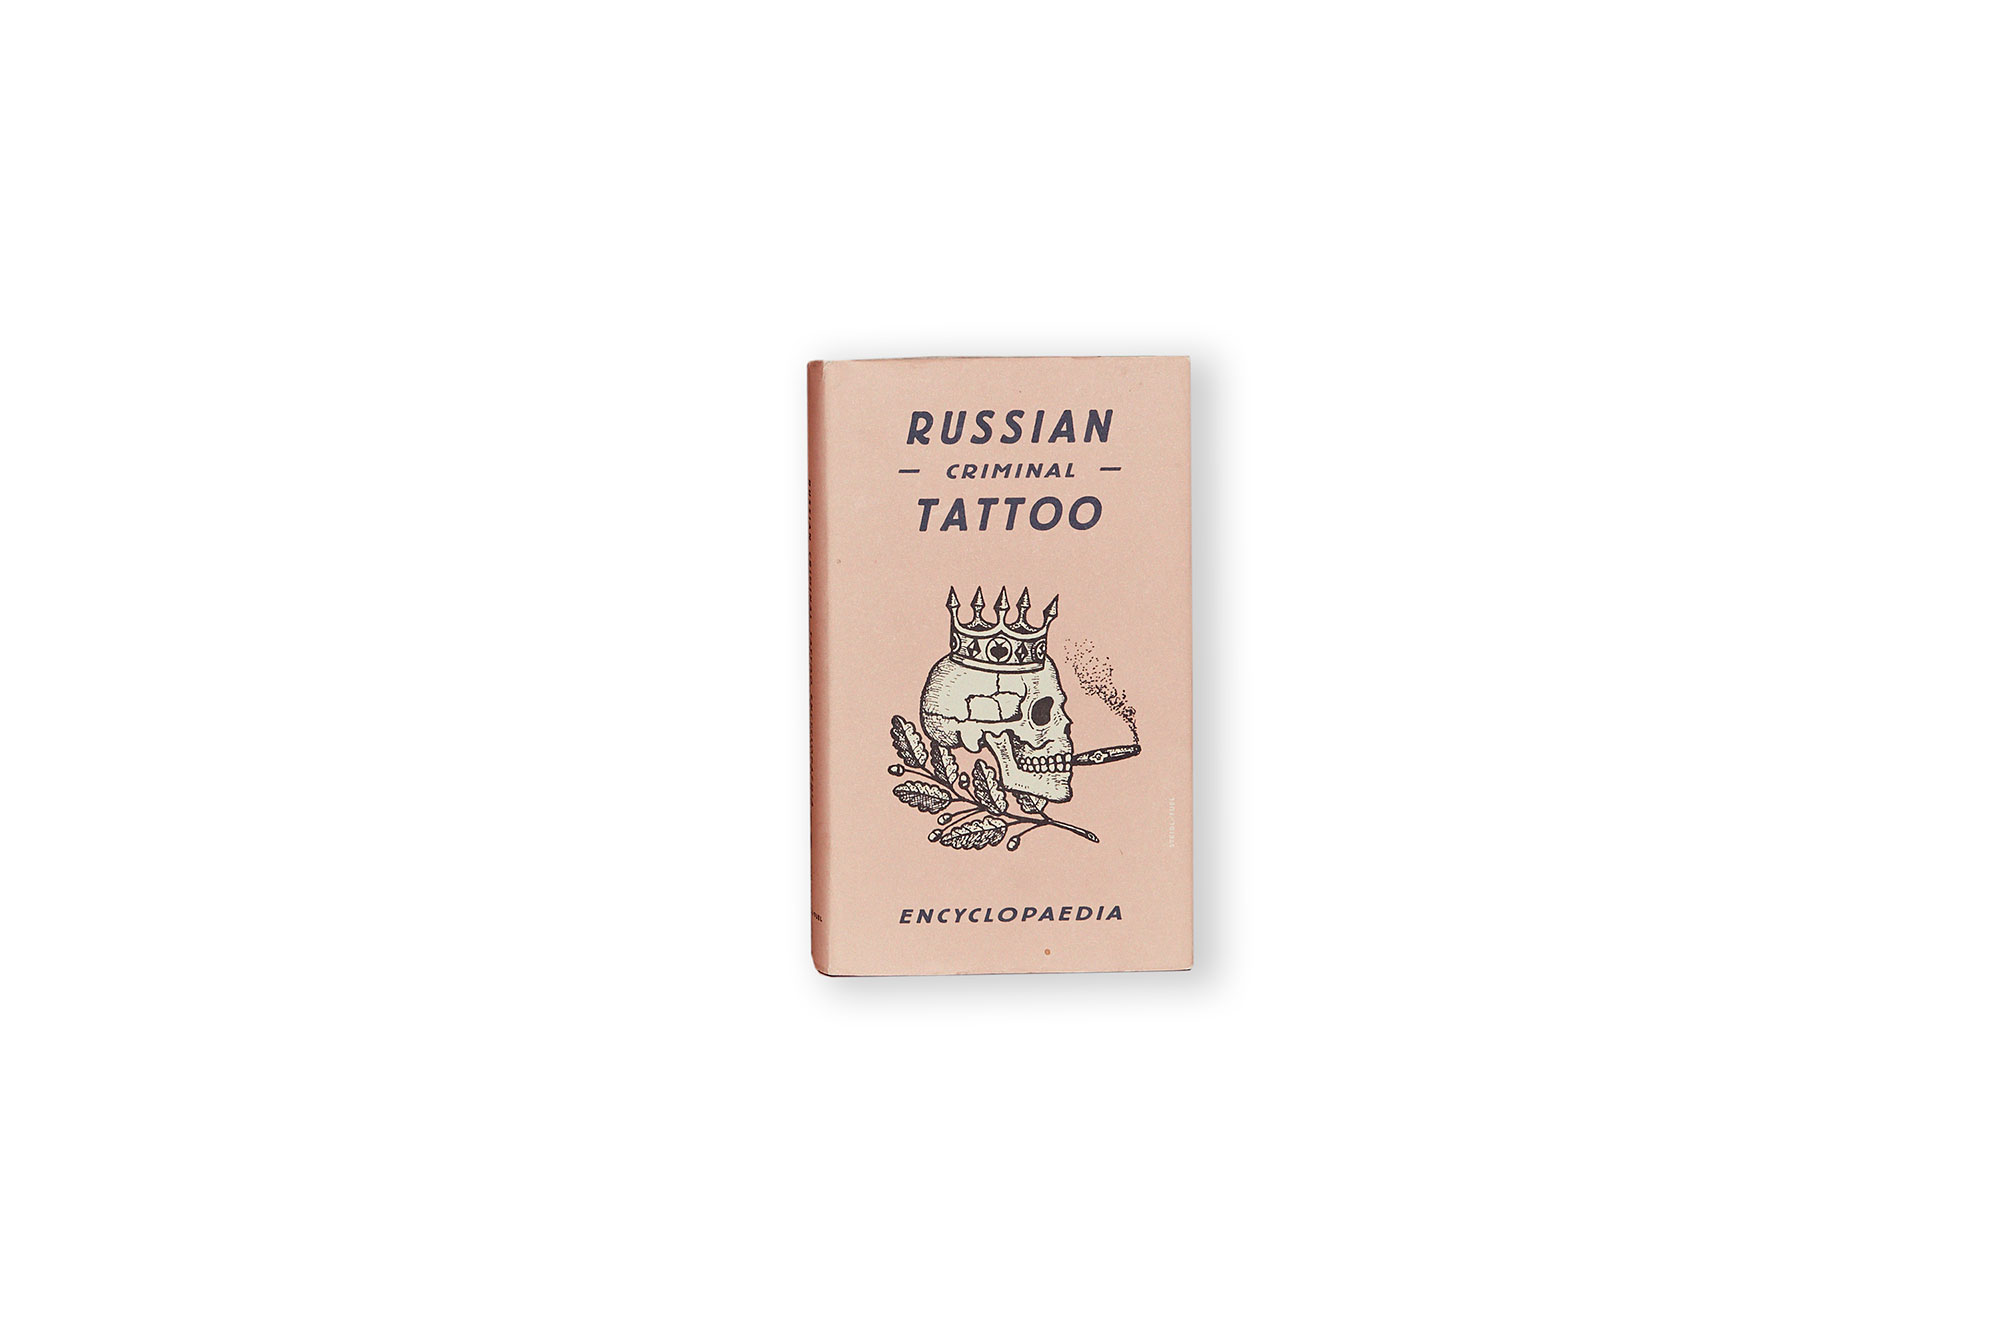 RUSSIAN CRIMINAL TATTOO, encyclopaedia.